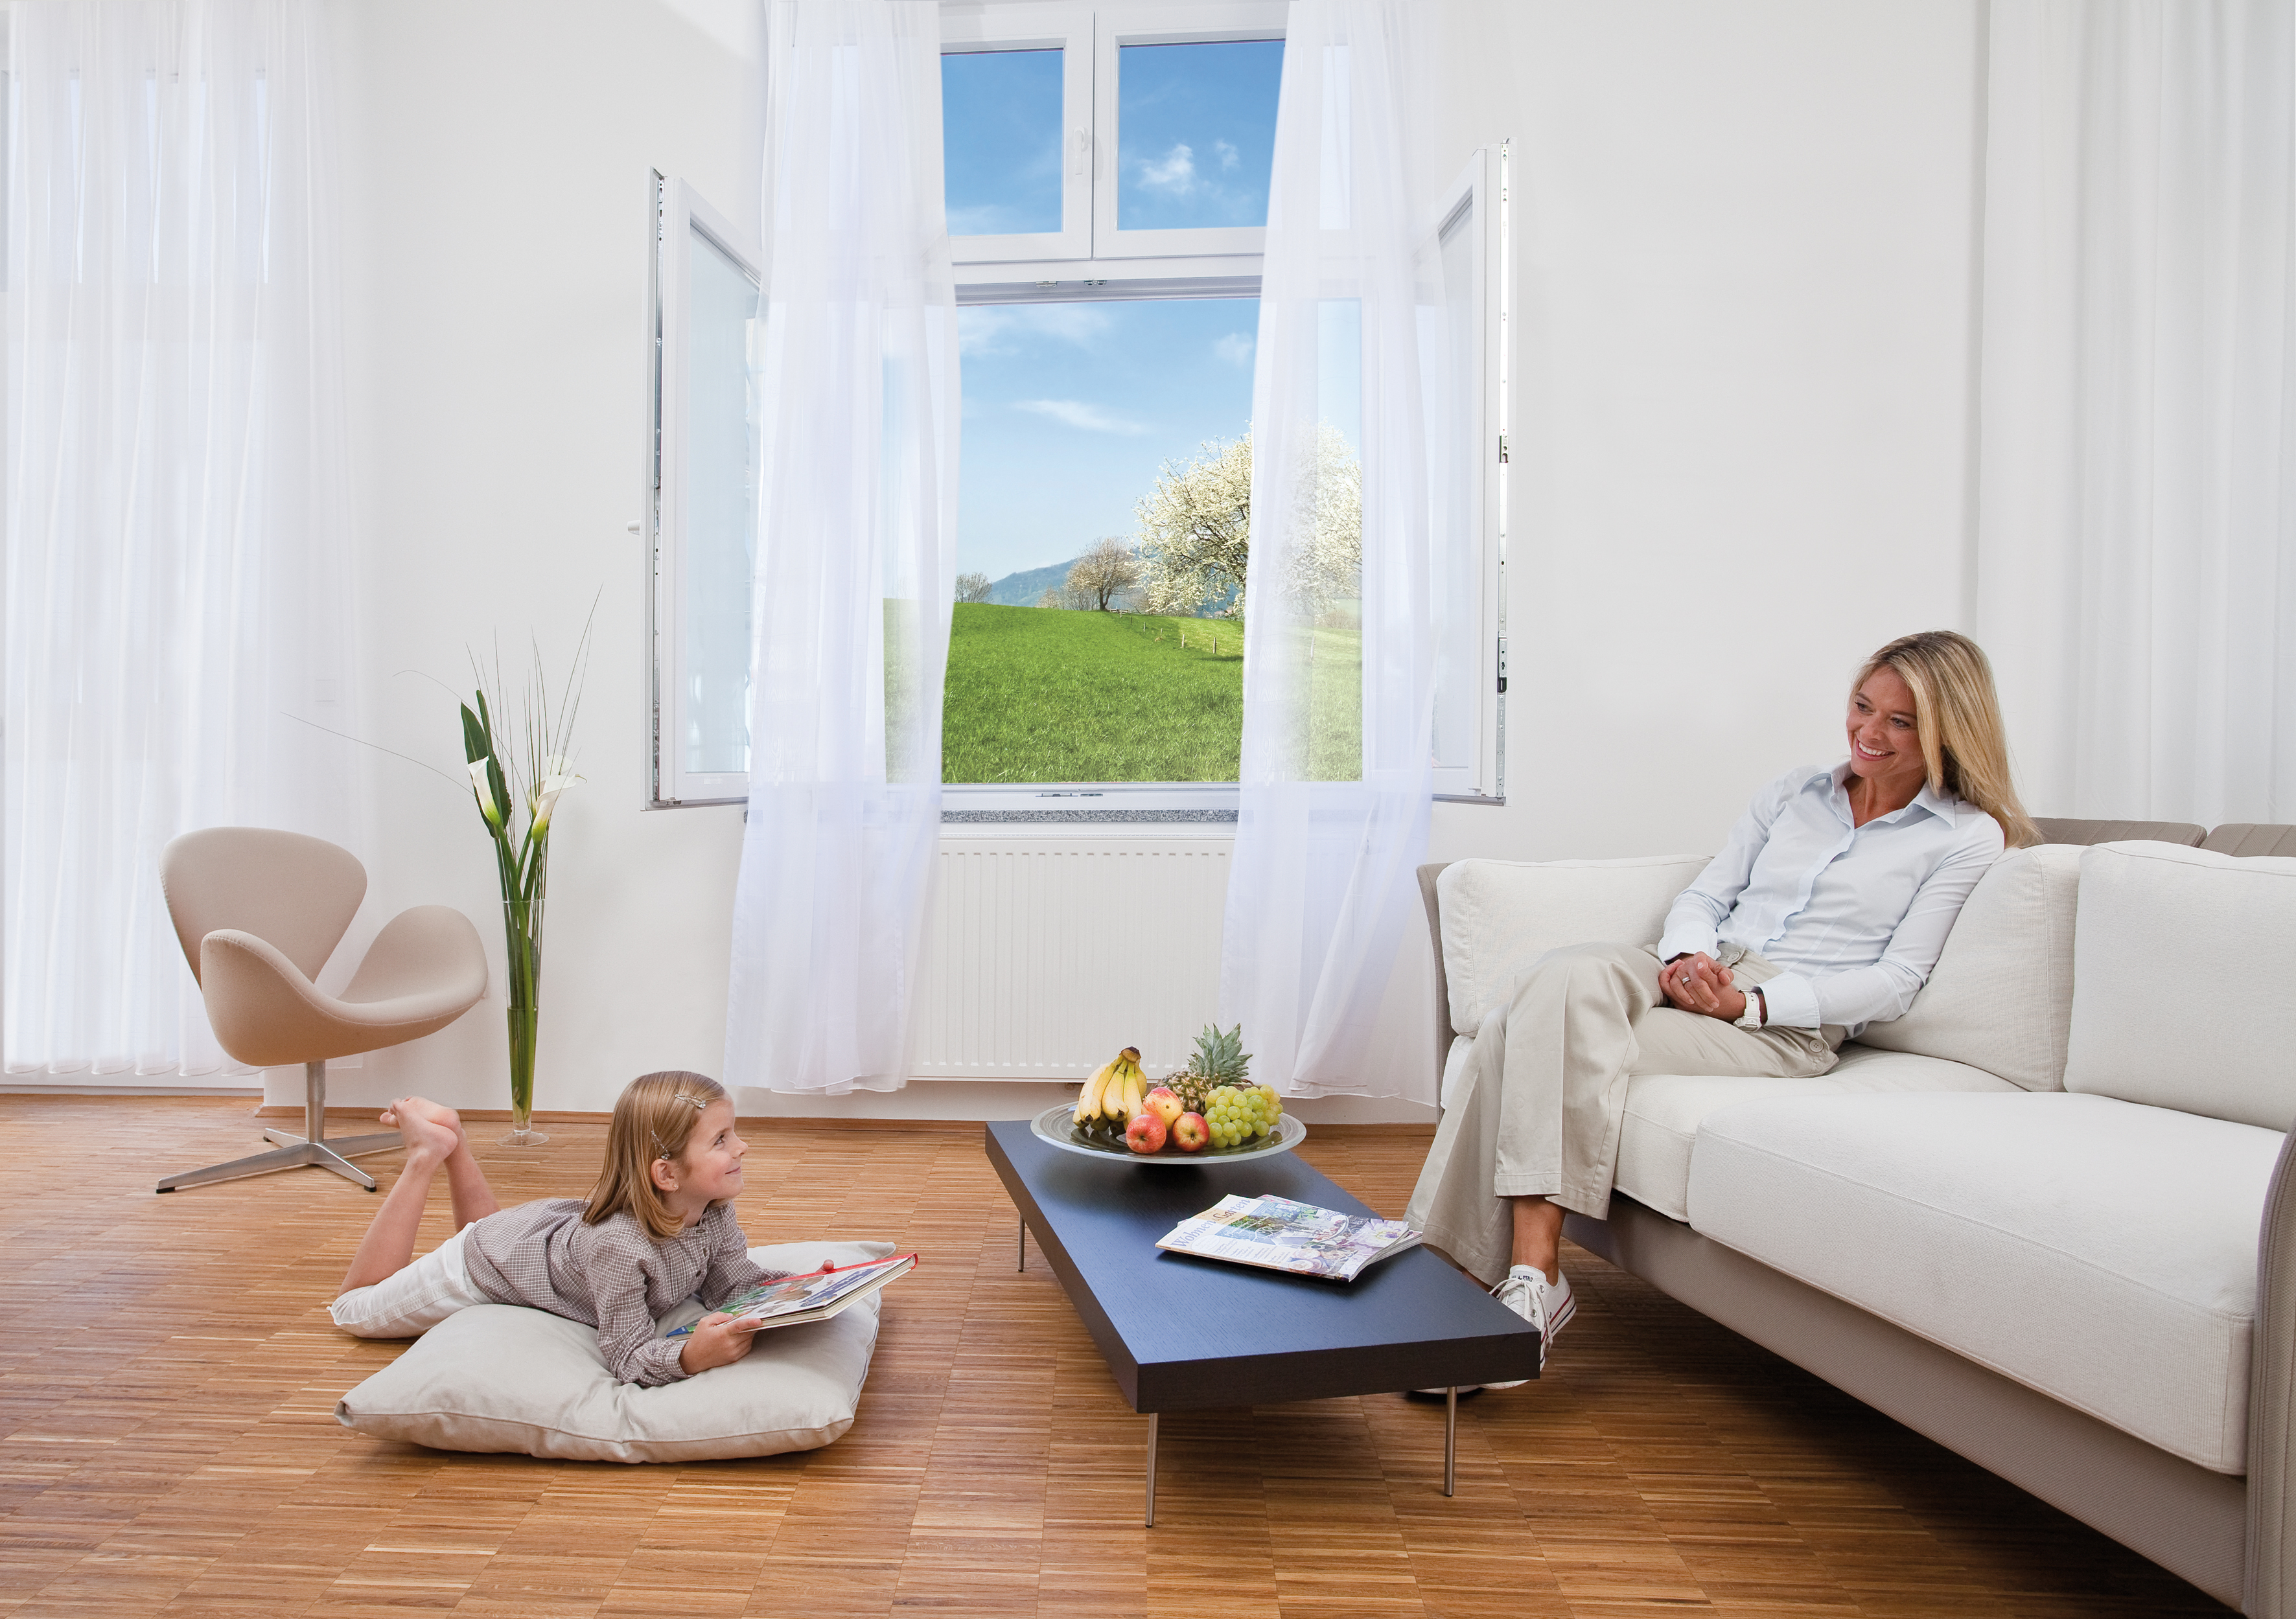 insektenschutz f r fenster. Black Bedroom Furniture Sets. Home Design Ideas